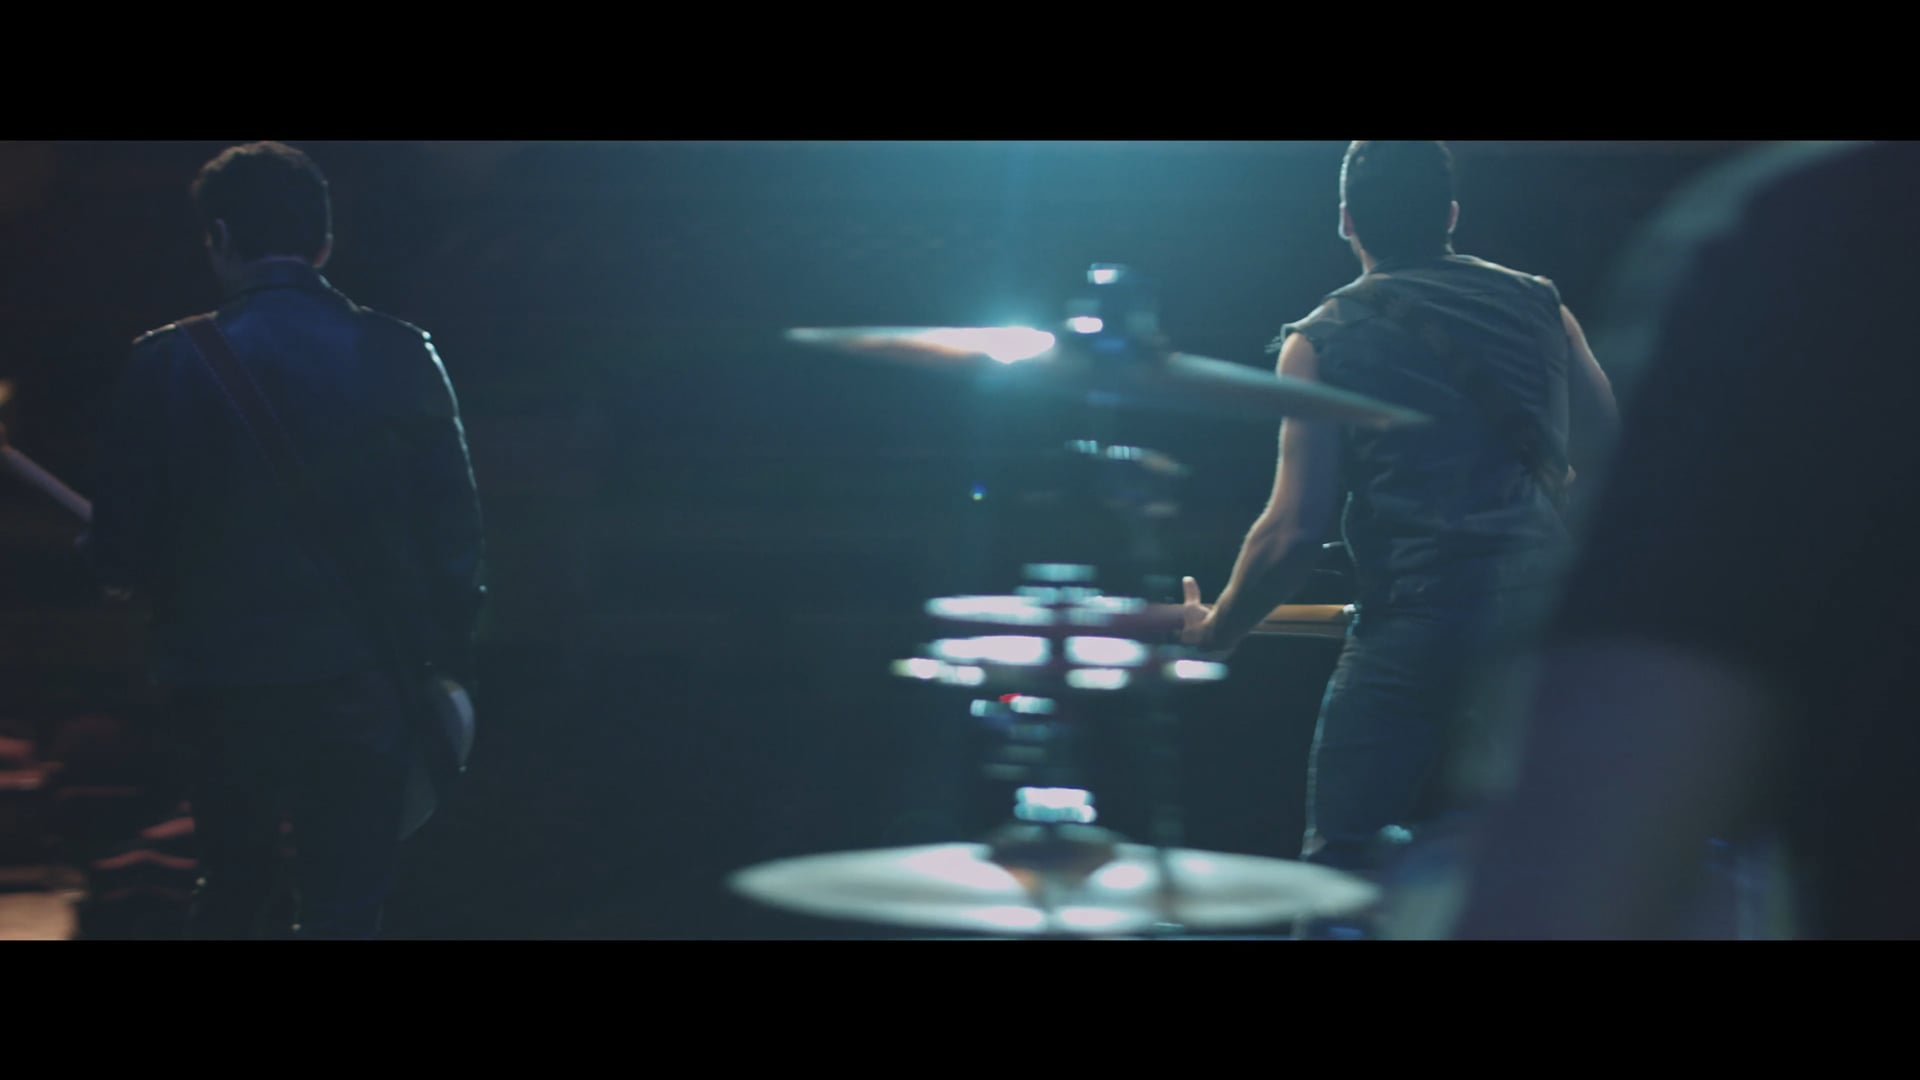 Daniel James and The Loveless - Let Me Go (Music Video)